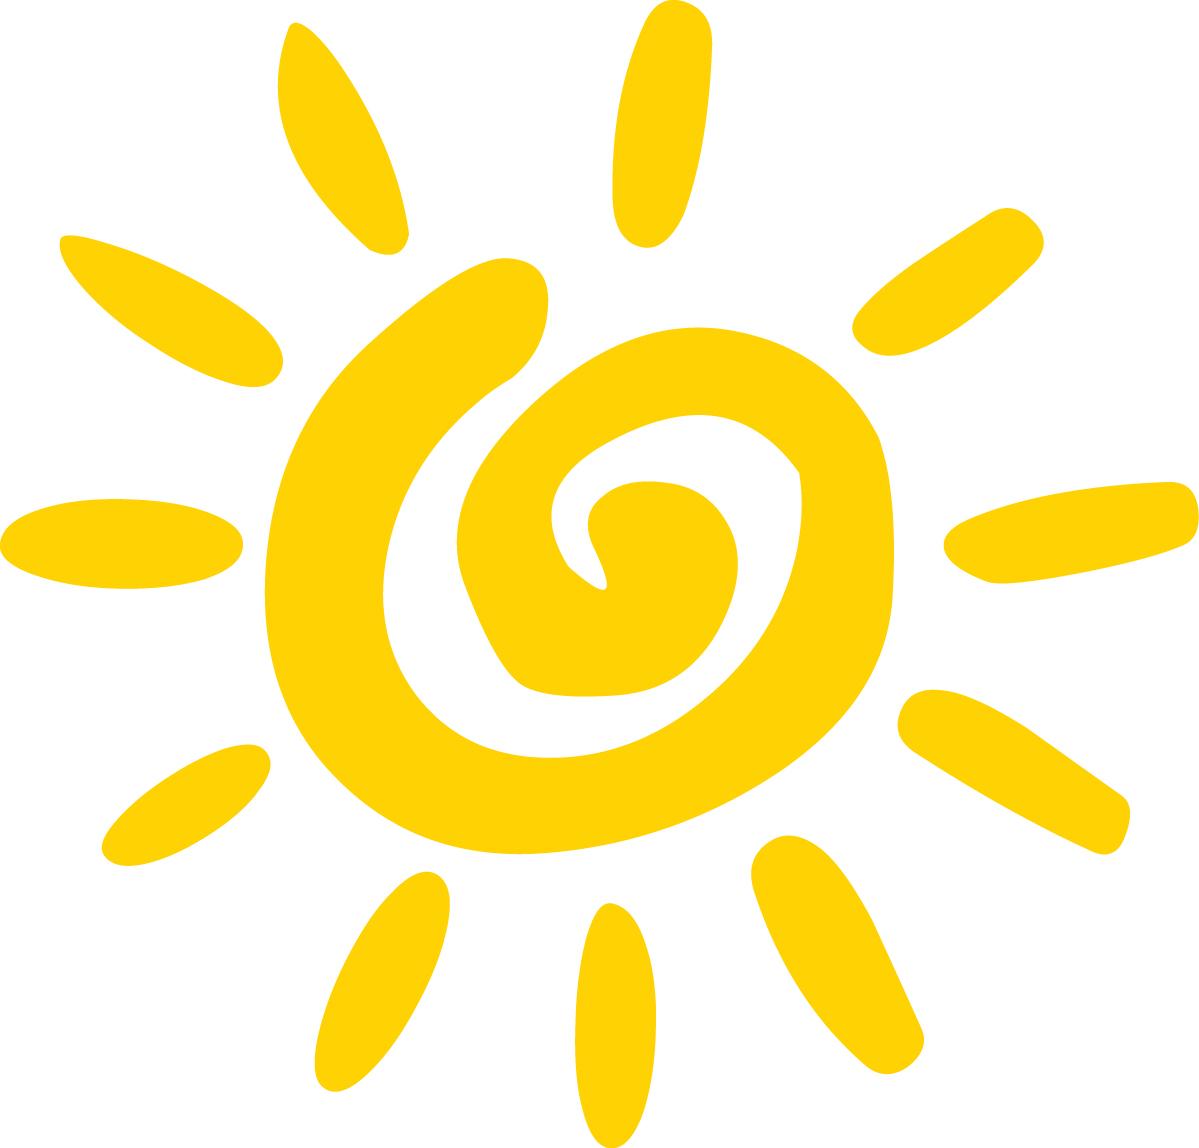 Ideas for Summer Activities 2012 Miss Kolis' Classroom ... (1199 x 1148 Pixel)